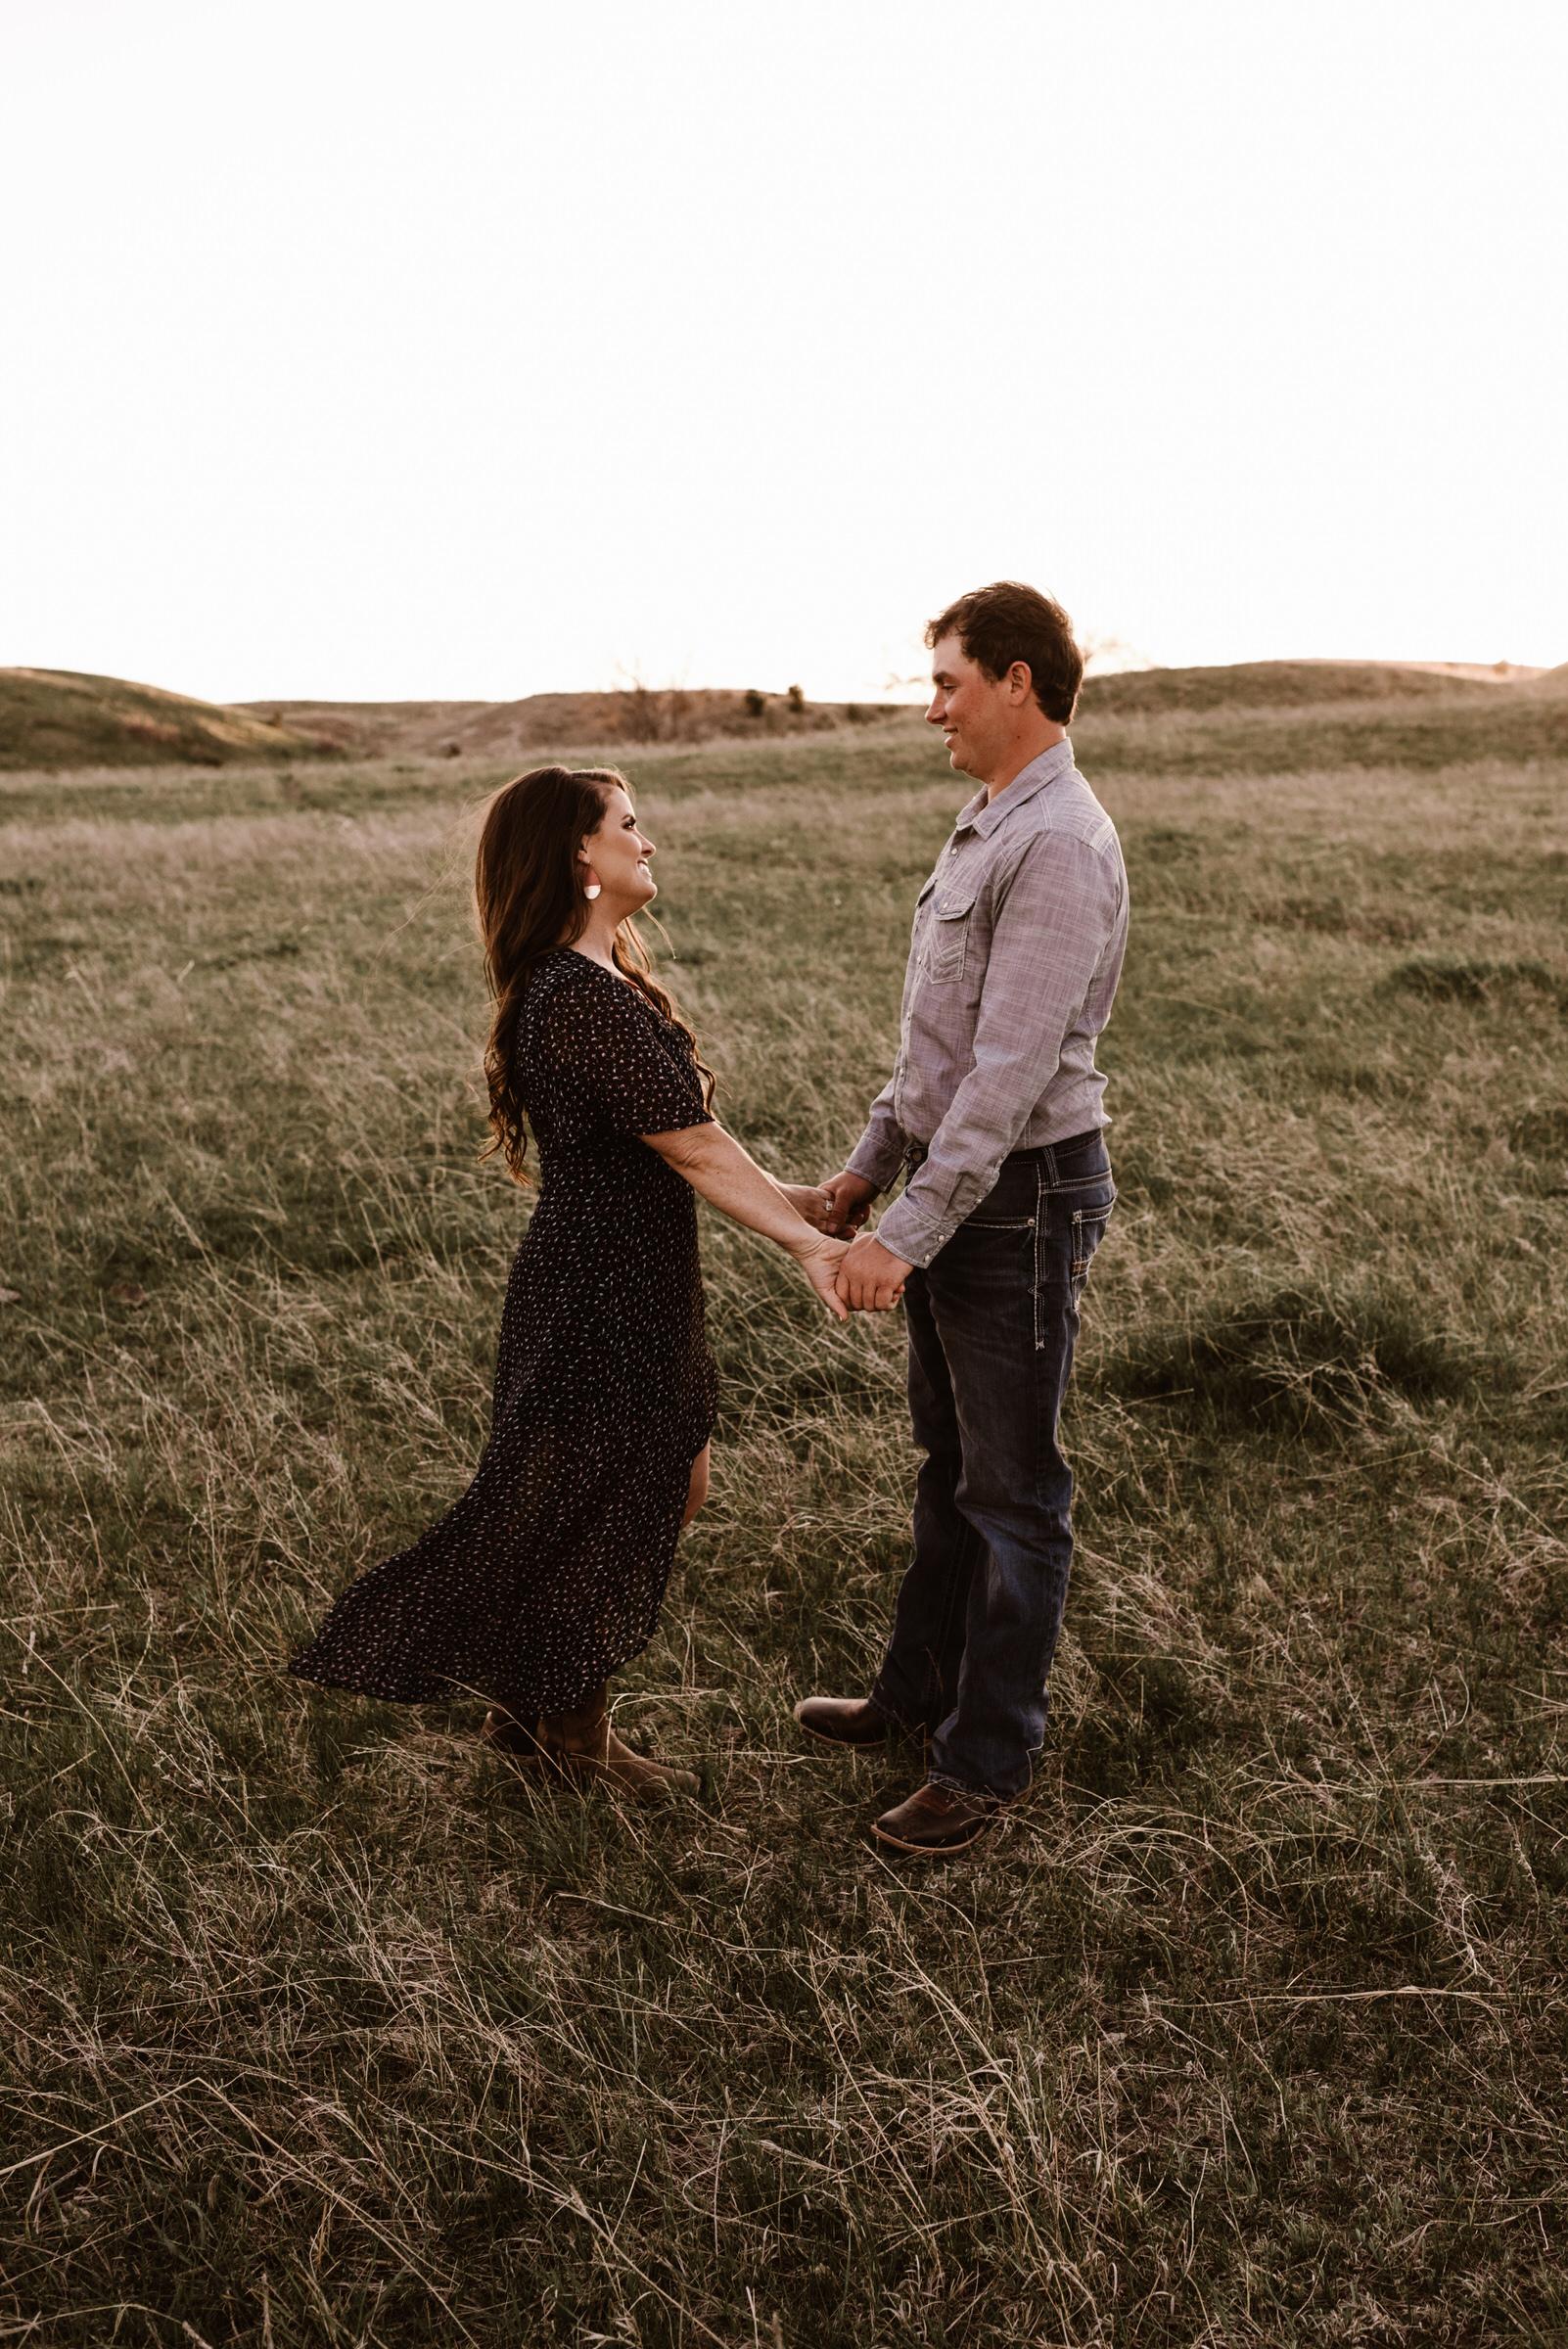 Sandhills-Nebraska-Engagement-Wedding-Photographer-Kaylie-Sirek-Photography-015.jpg